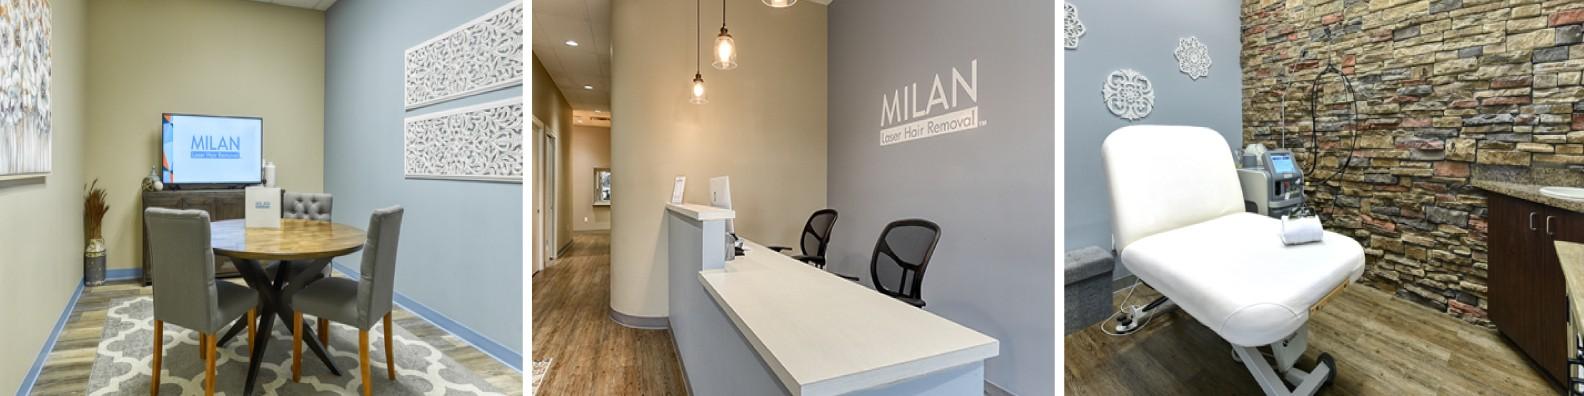 Milan Laser Hair Removal Linkedin